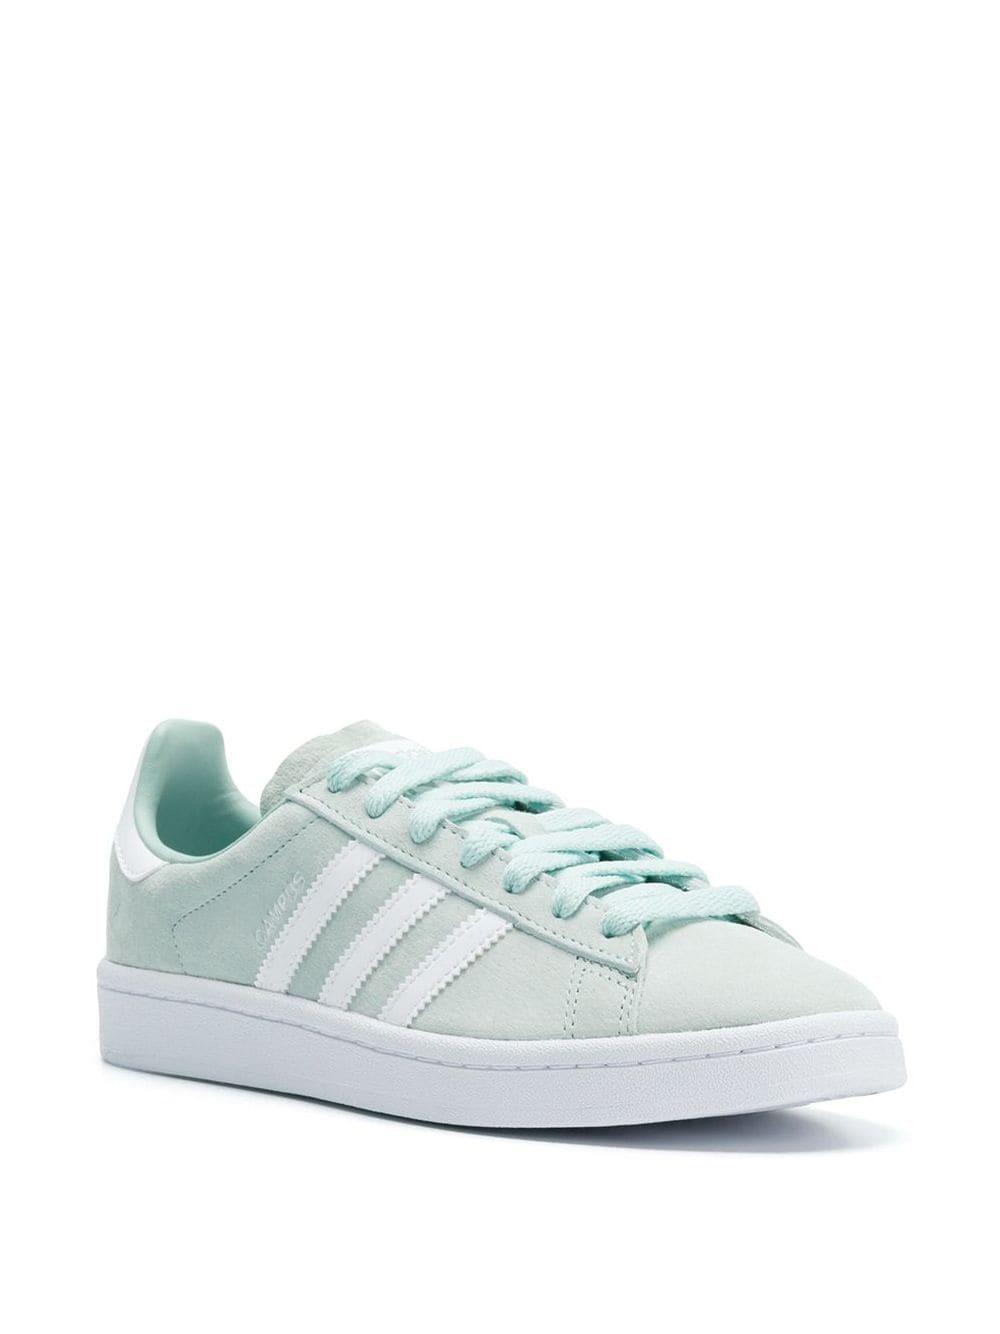 adidas Cotton Originals Campus Sneakers in Green